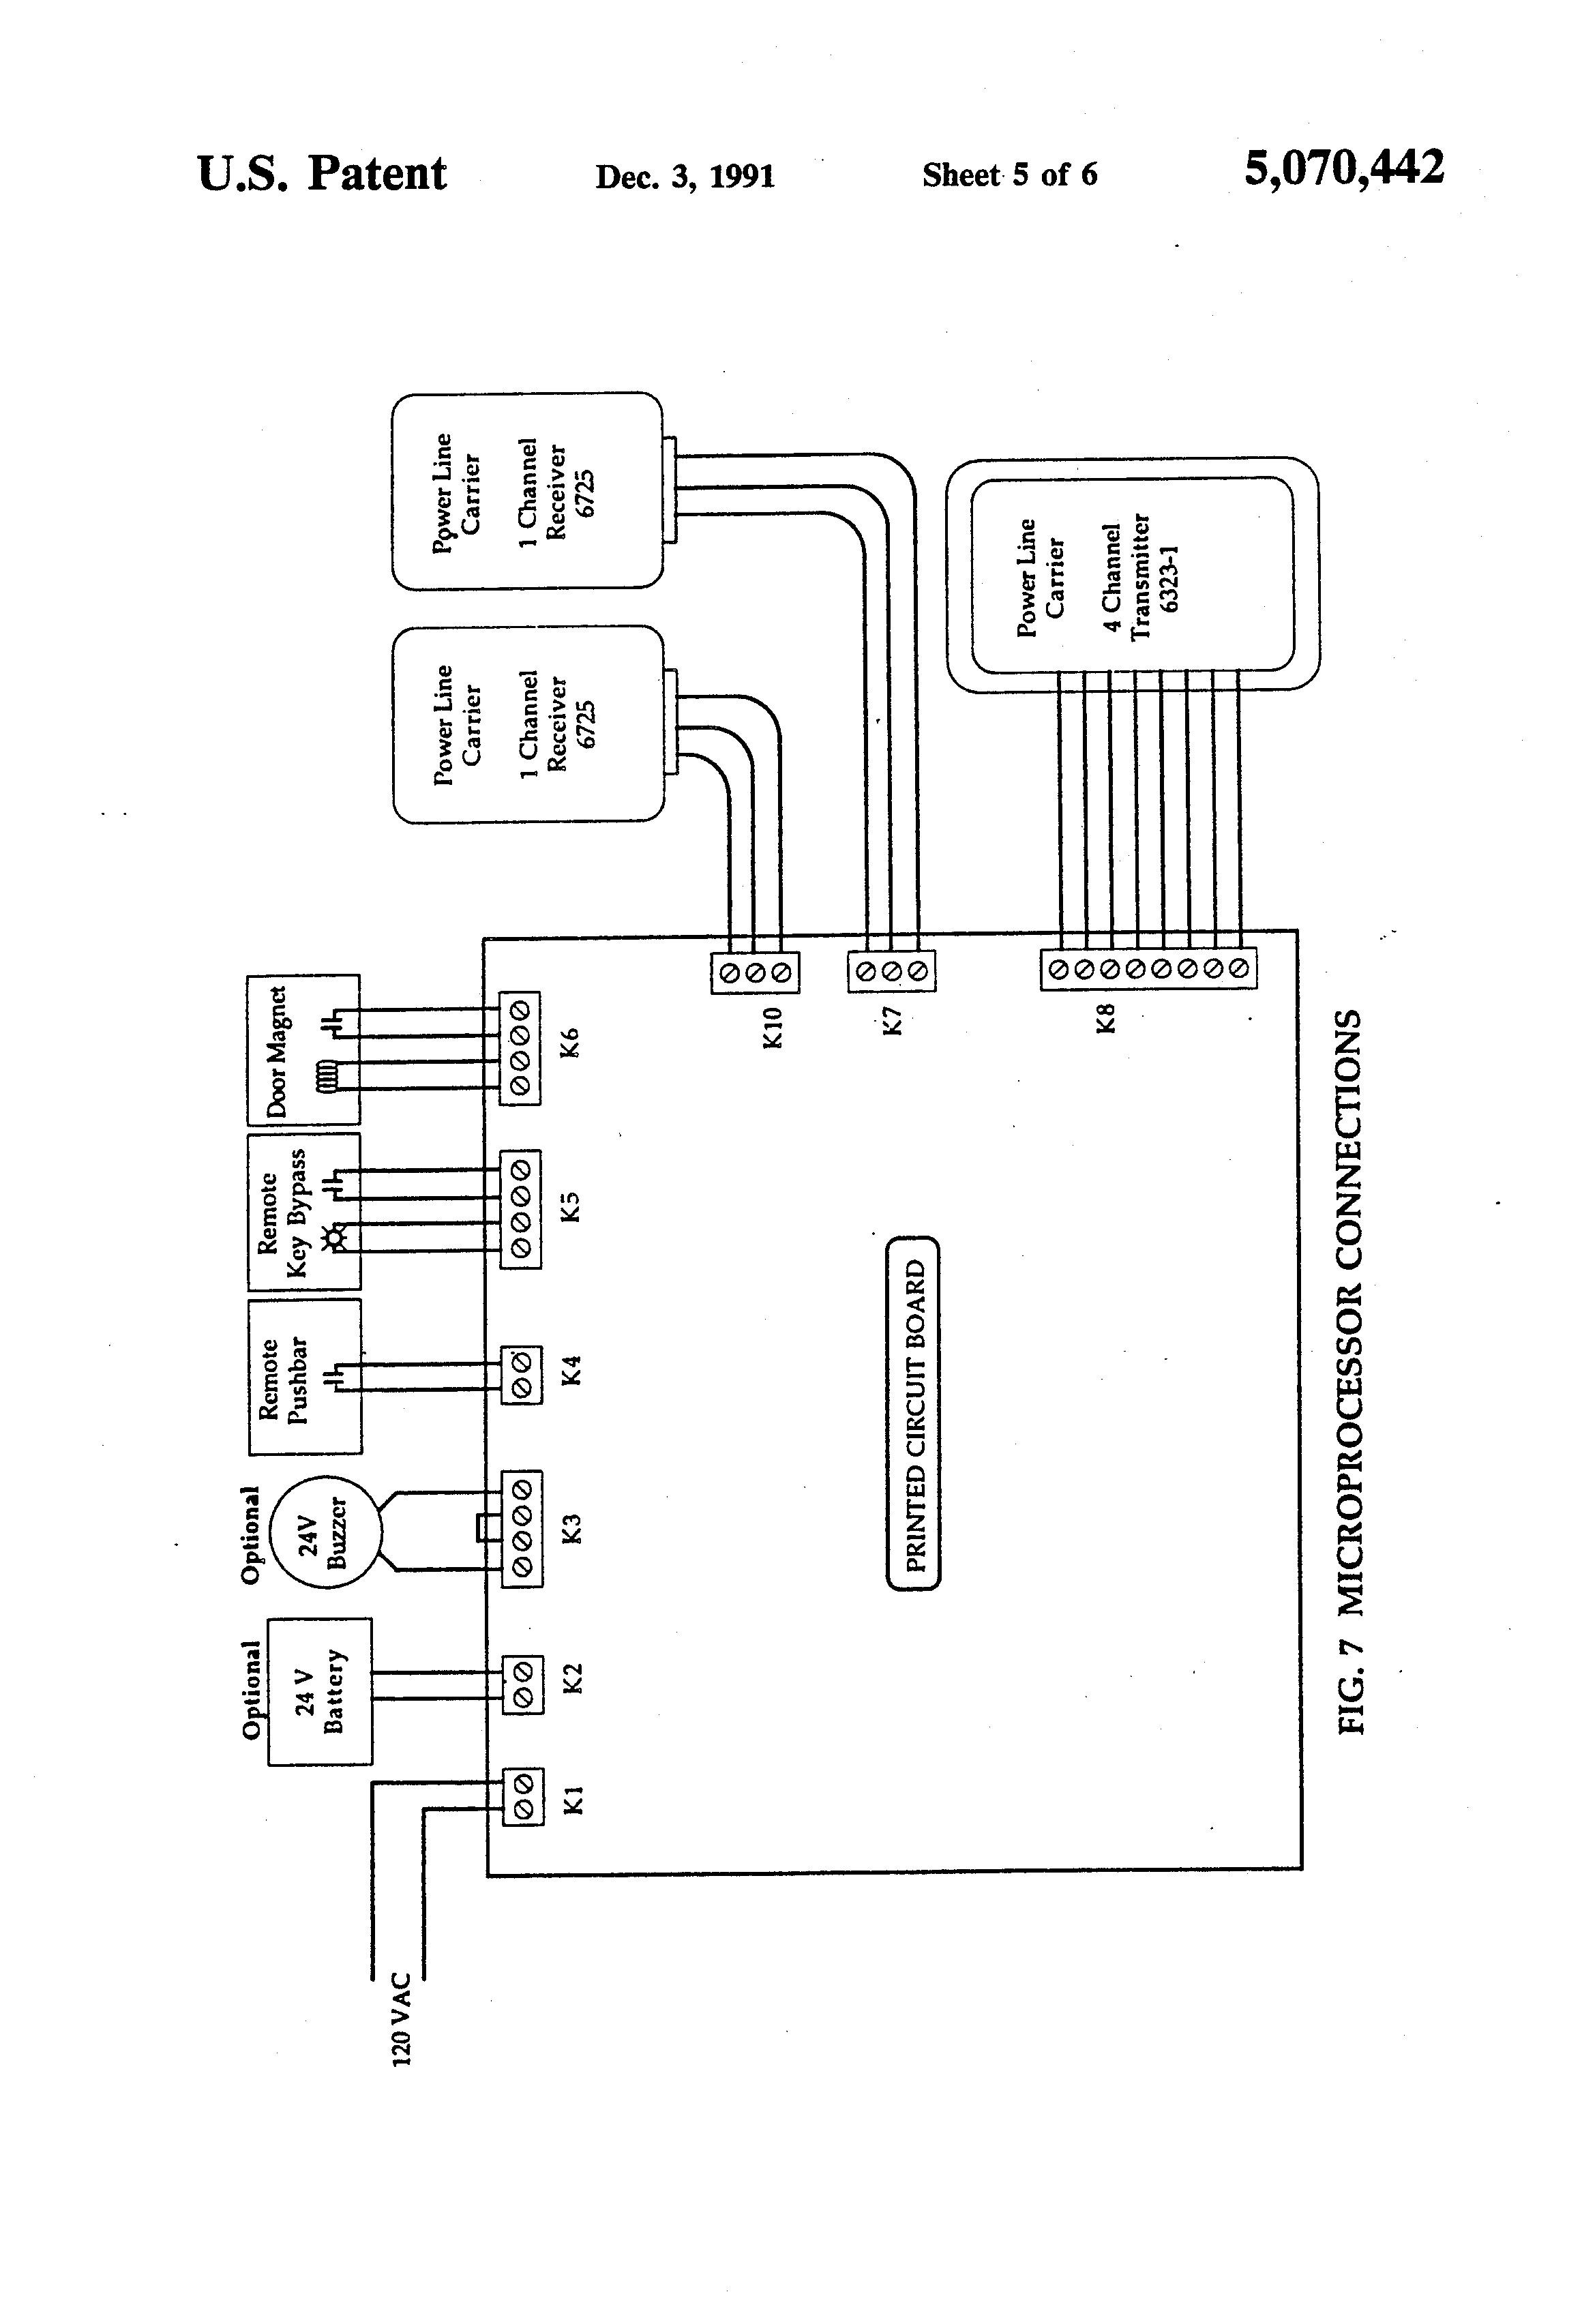 Hydraulic Pump Diagram Monarch Wiring 4 Elegant Emergency Door Release 91 With Additional 12 Of